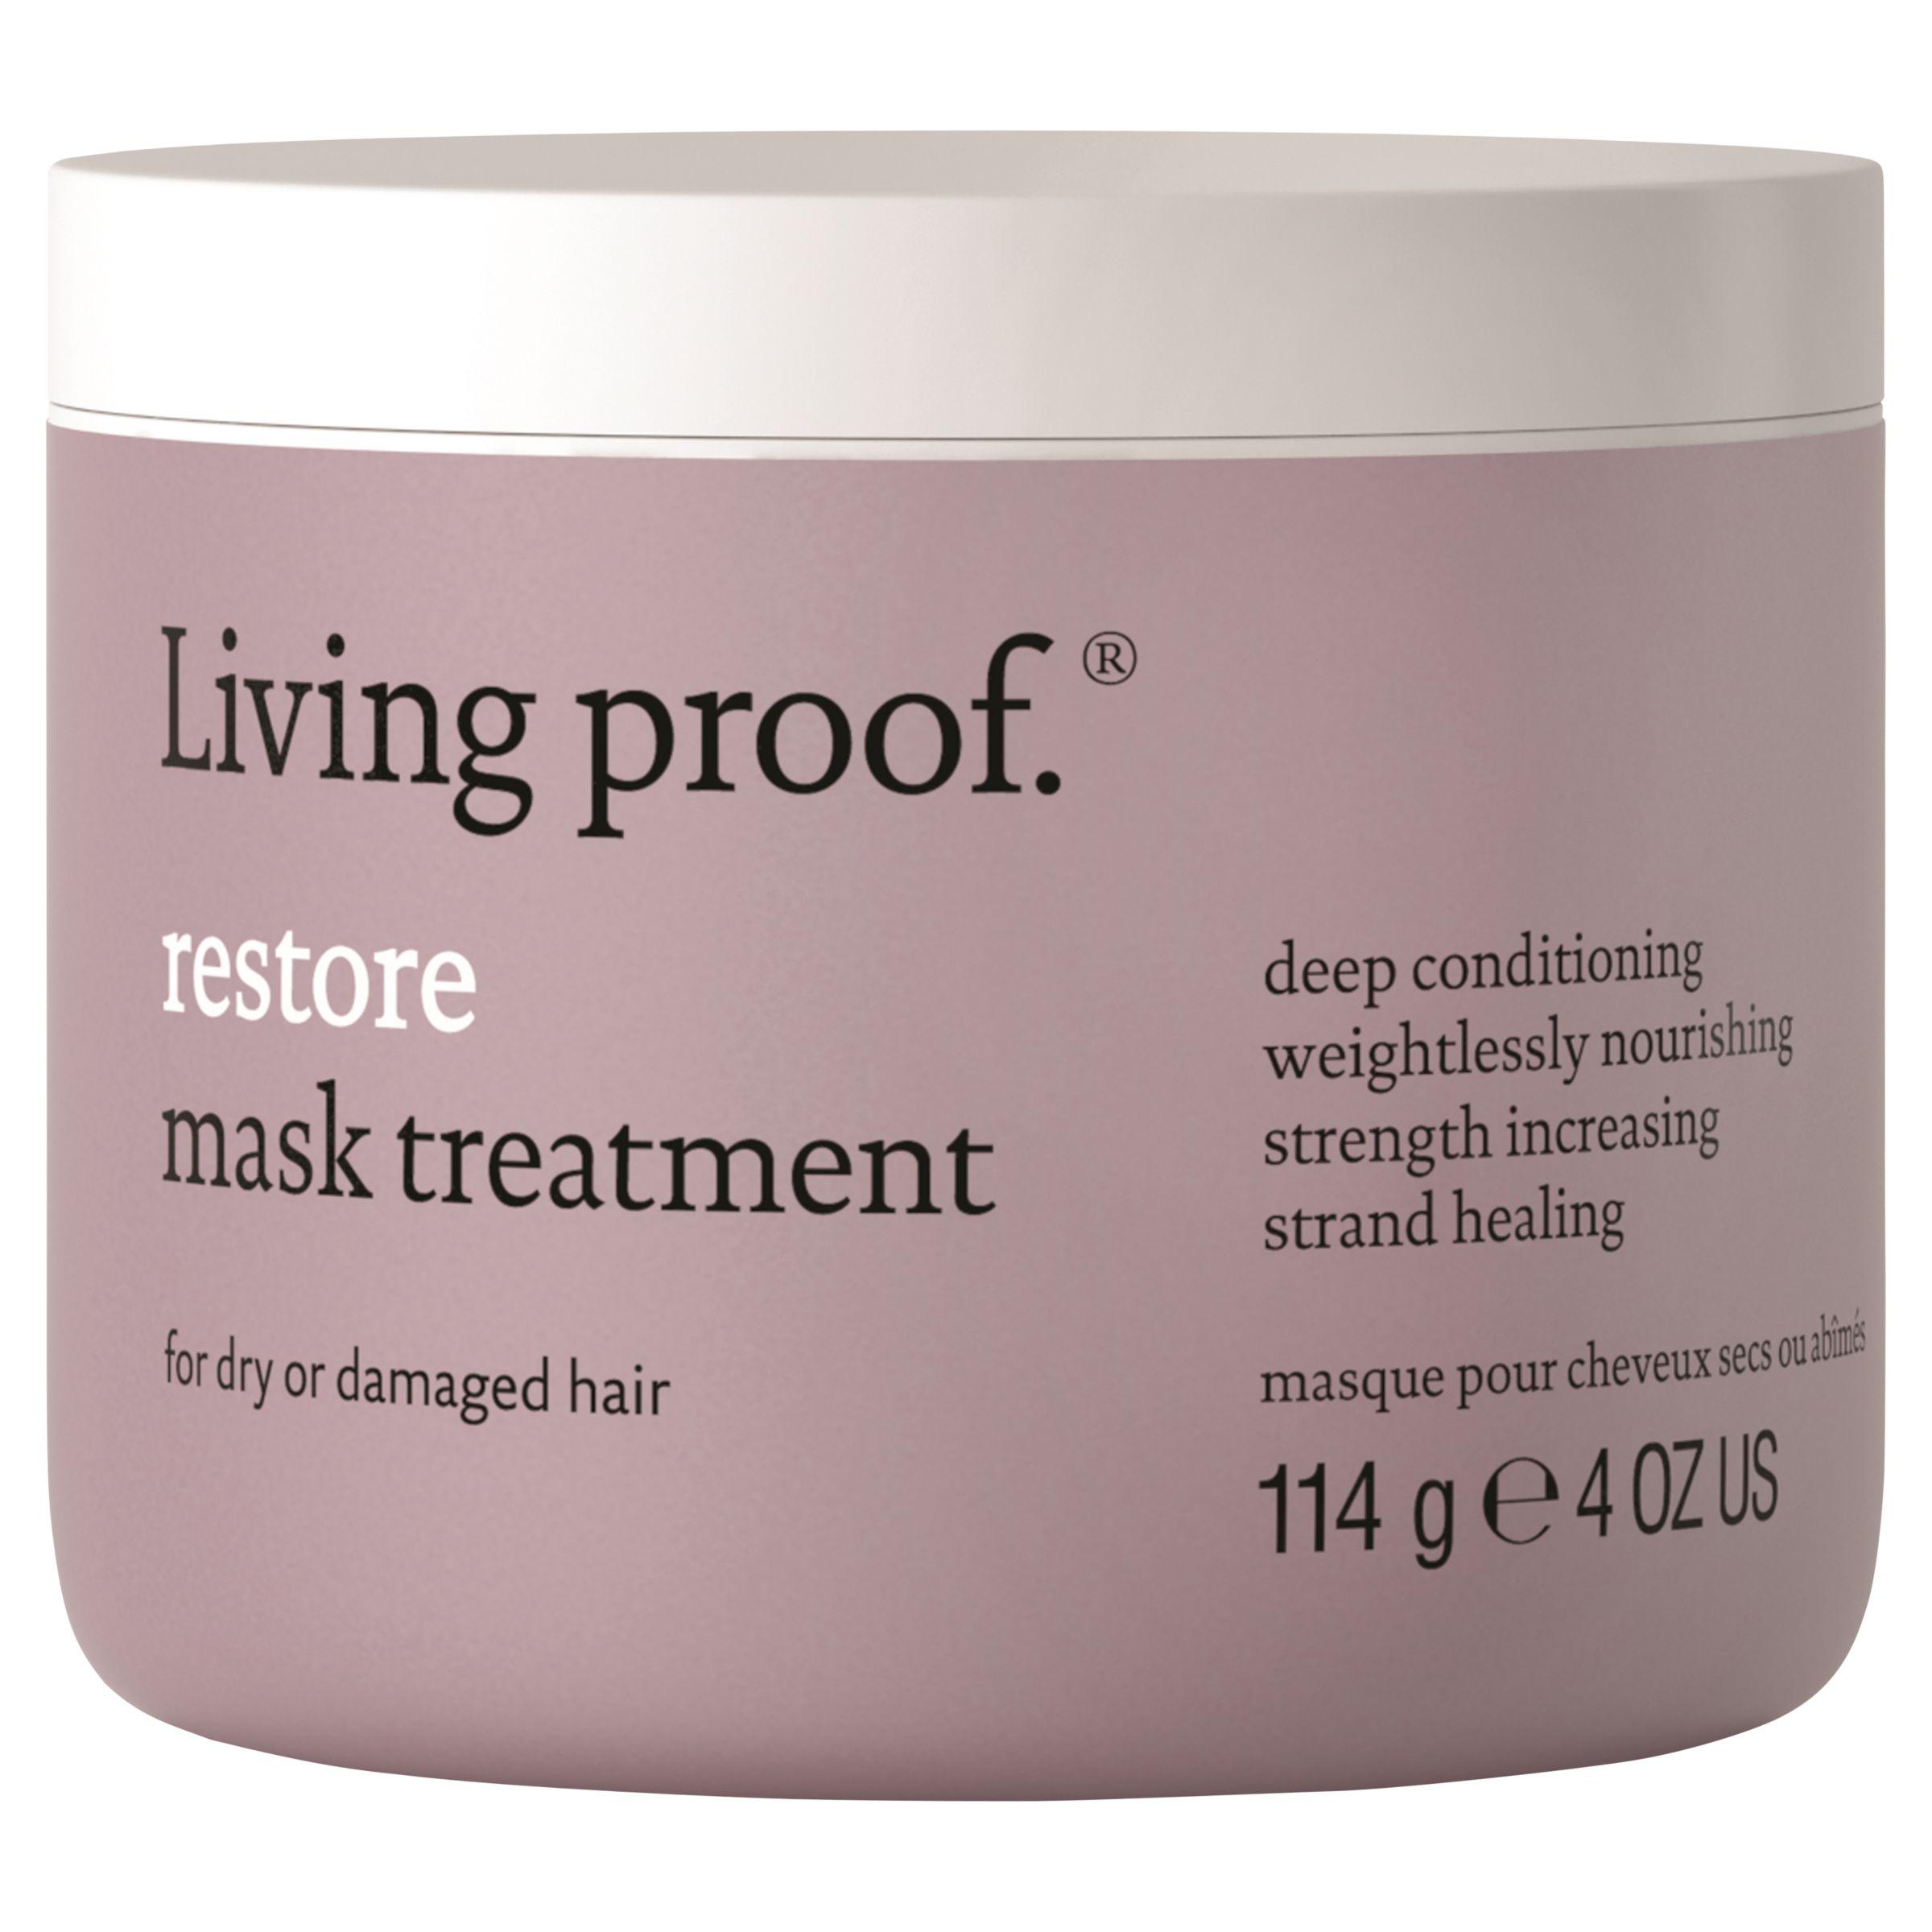 Living Proof Living Proof Restore Mask Treatment, 114g